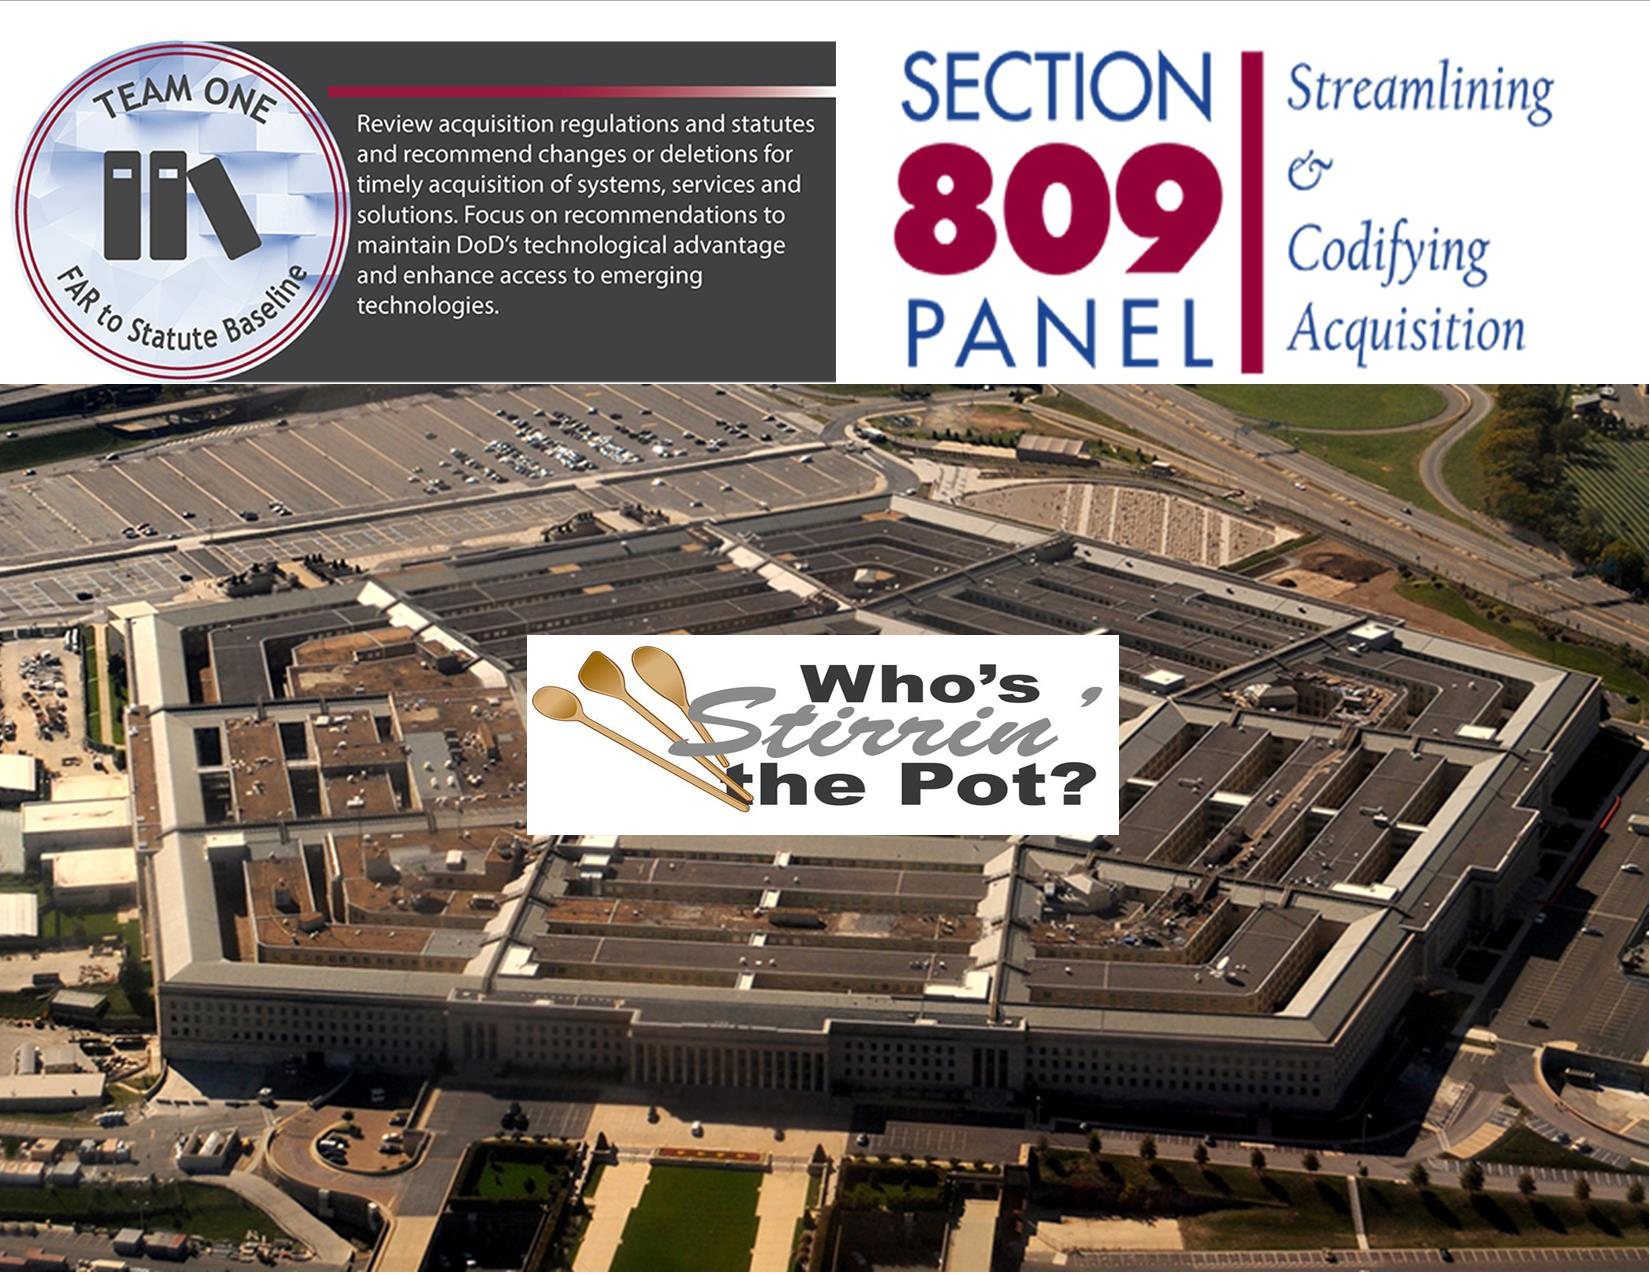 Pentagon Who's Stirrin the Pot